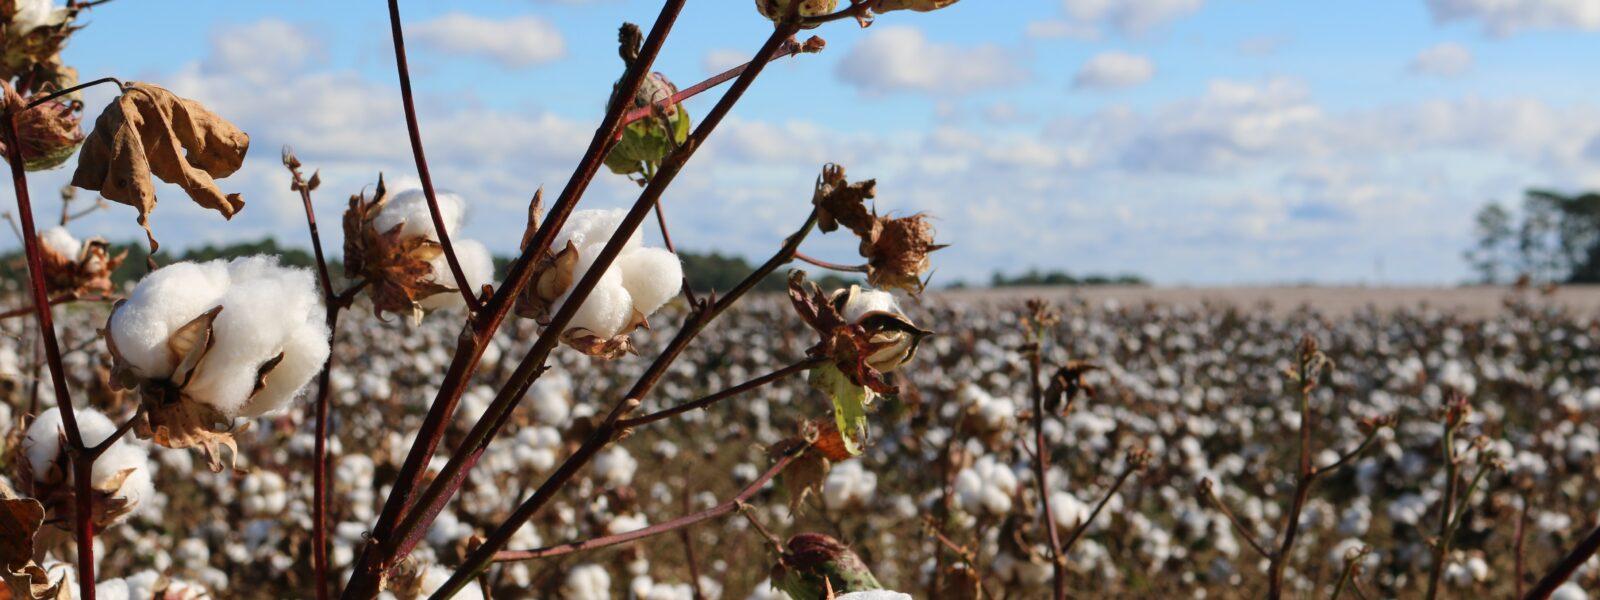 A cotton field